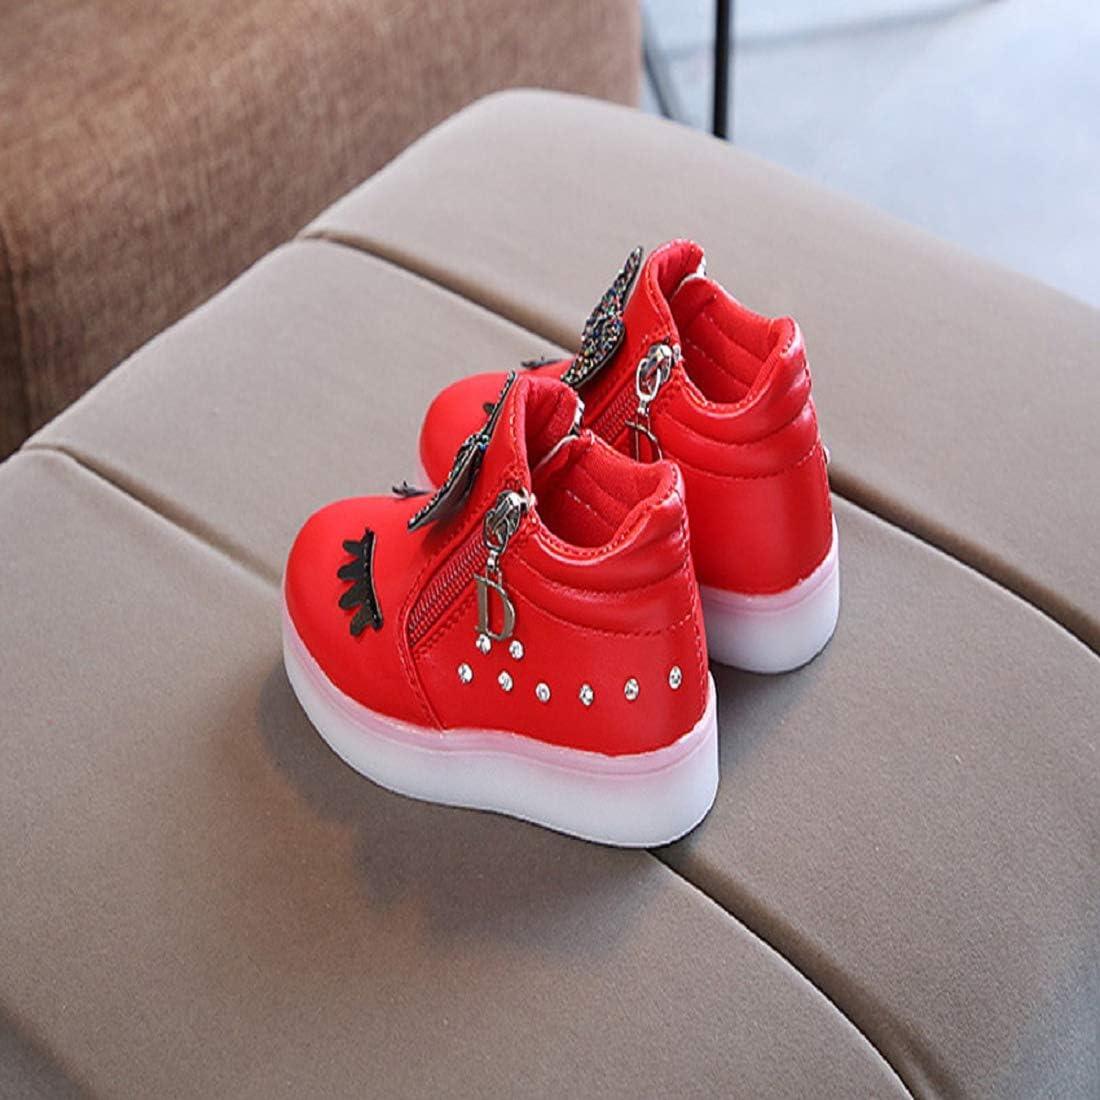 Bkolouuoe Doddler Kids LED Luminous Shoes Baby Girls Crystal Bowknot Eyelash Zip Boots Sneakers Sport Shoes